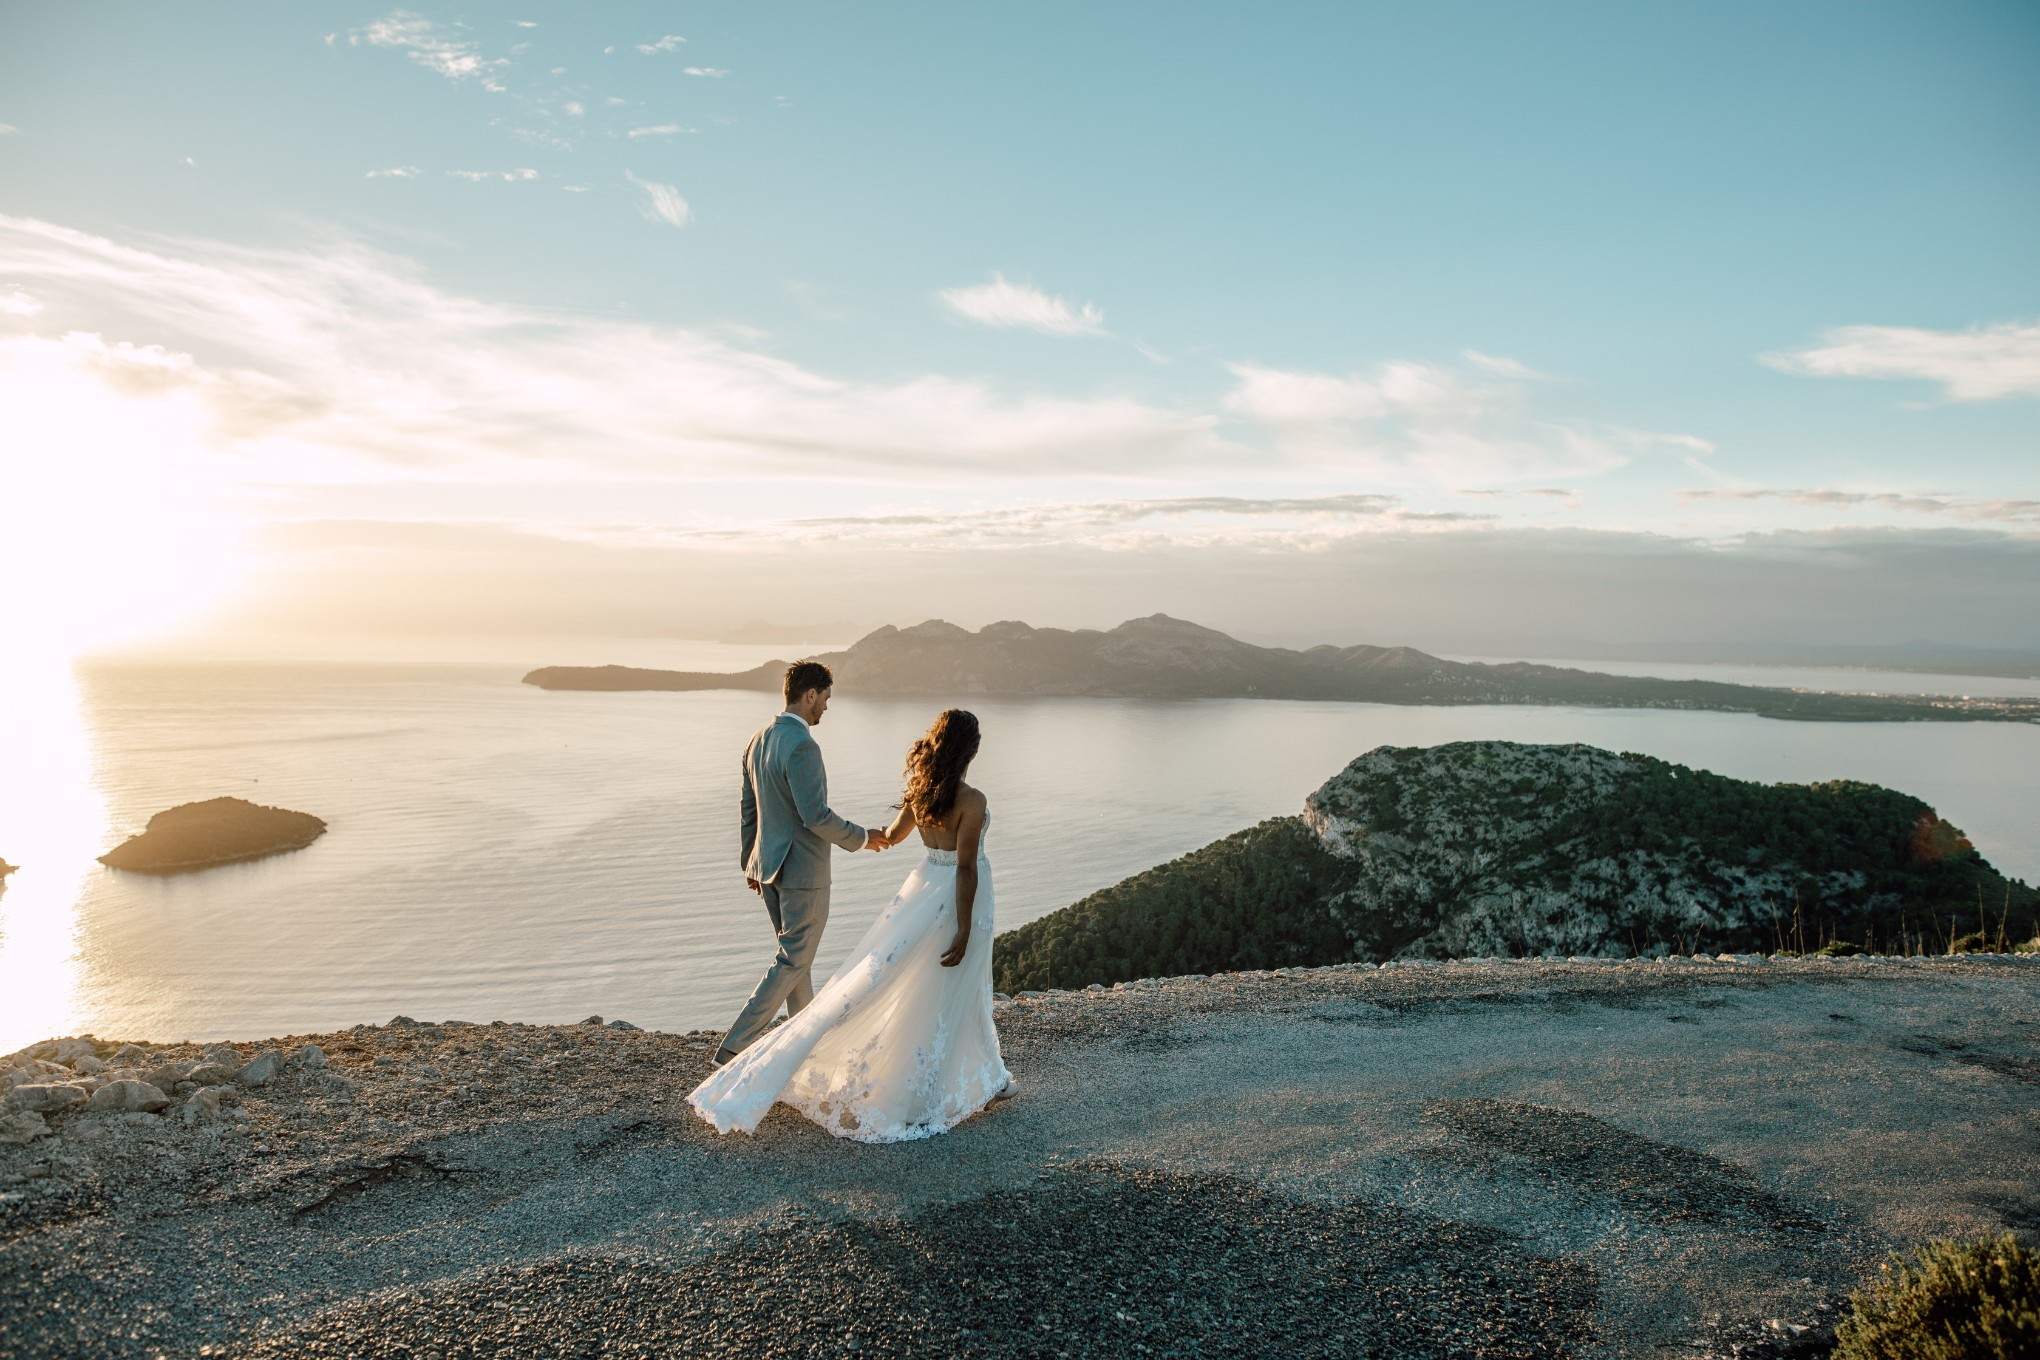 Mallorca-Hochzeit-Pia-Anna-Christian-Wedding-Photography-MM-1-2.jpg